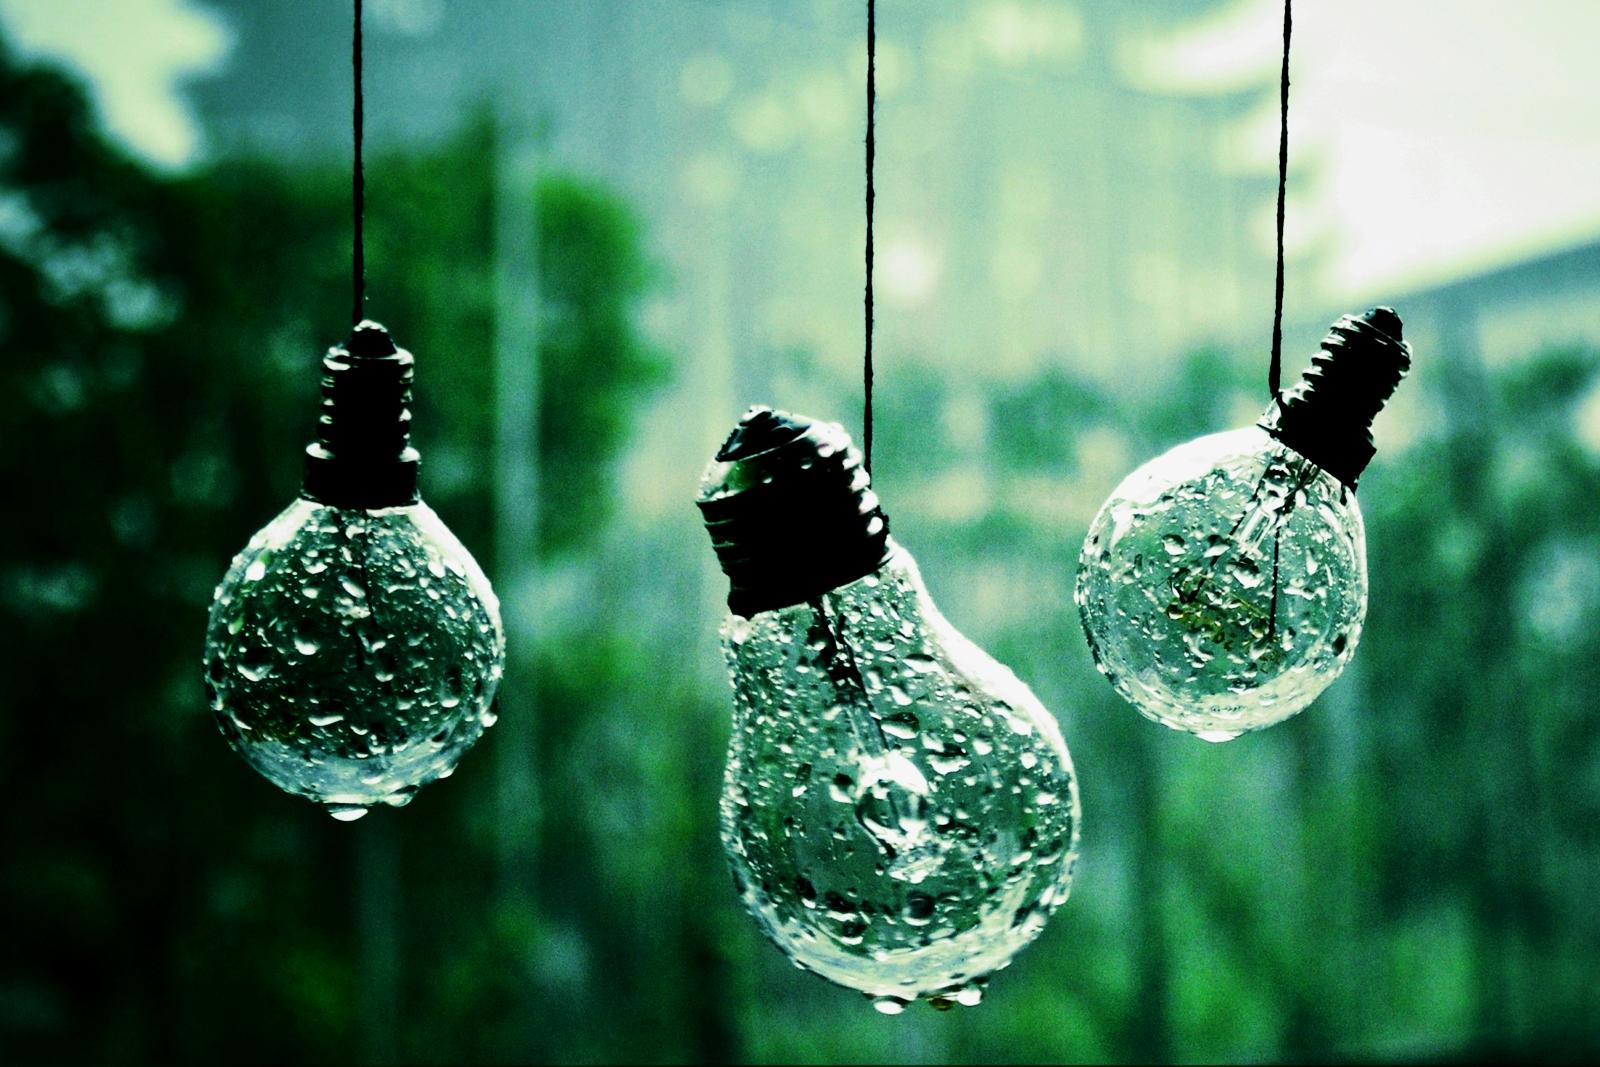 Rain Drops HD Wallpaper Wallpaper ImageBankbiz 1600x1067